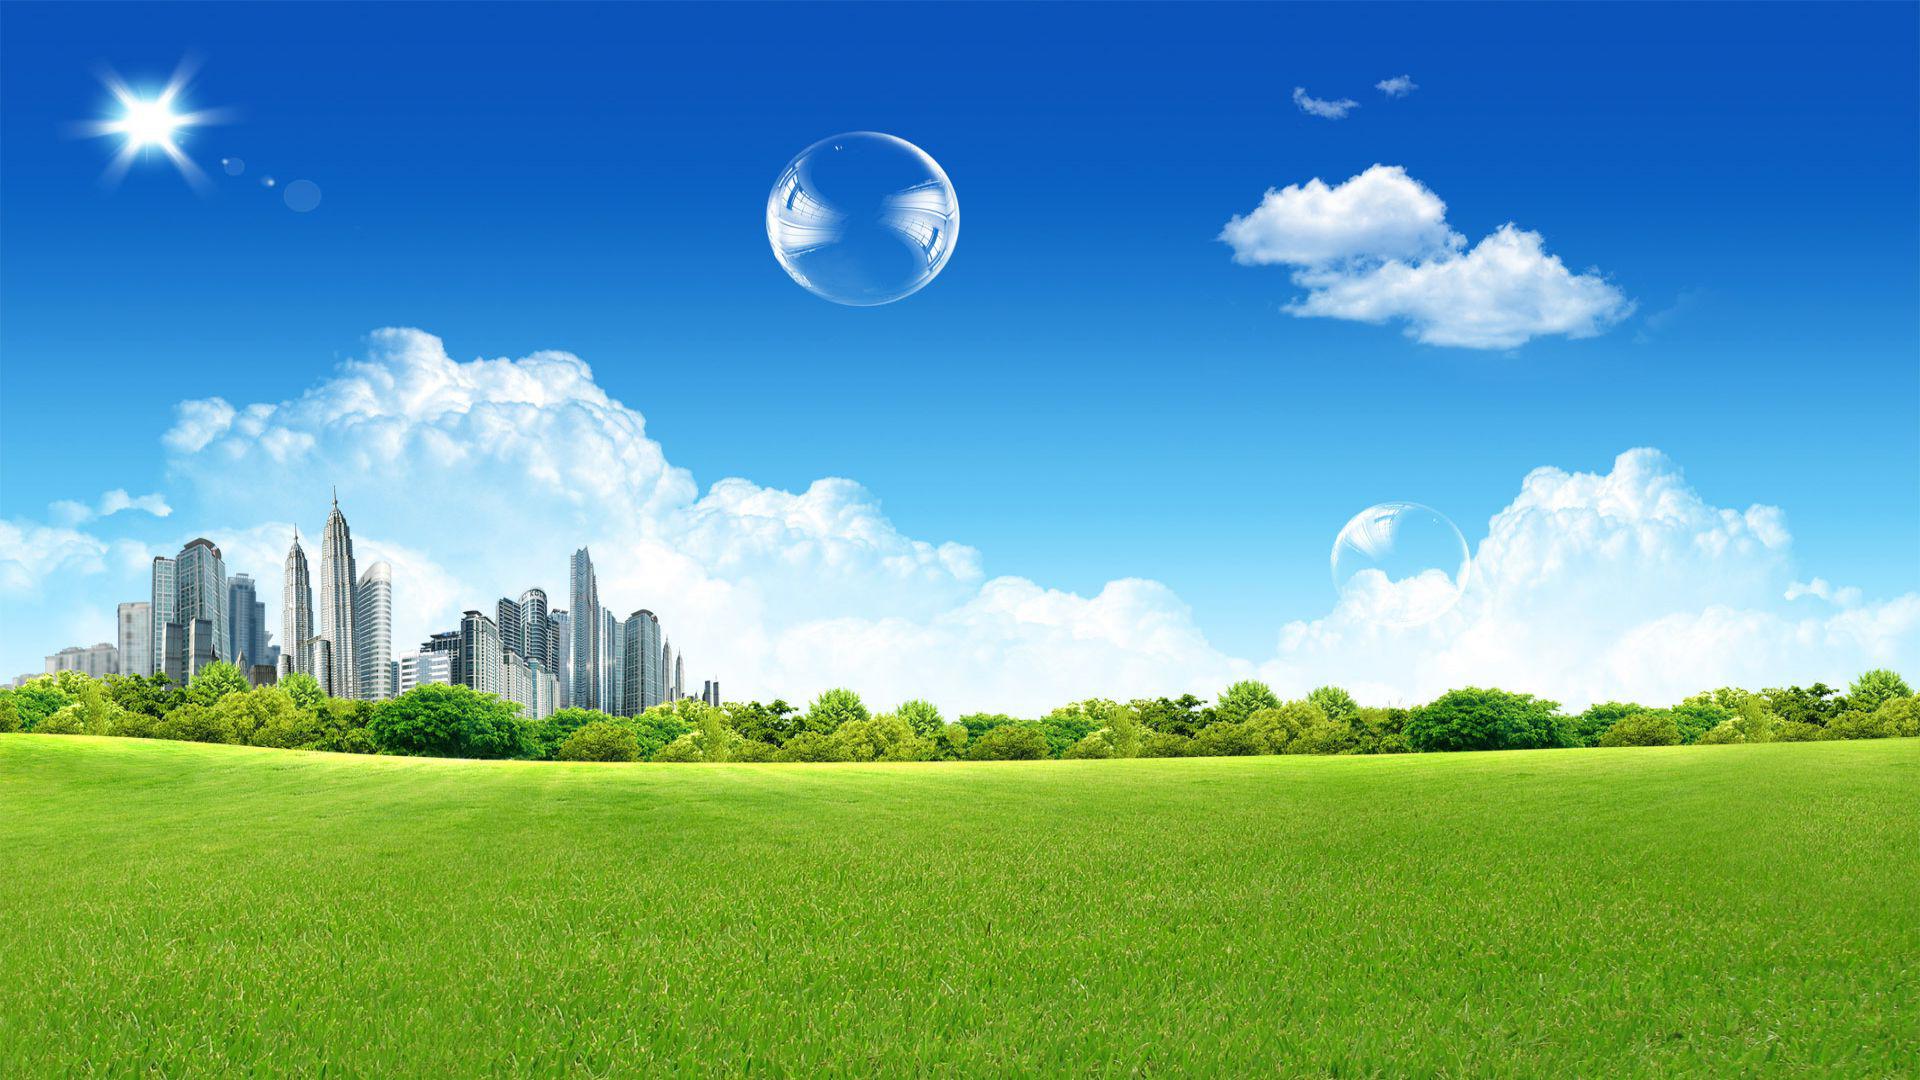 green city Location city office 260 west 100 north po box 97 fountain green, ut 84632  tel: (435) 445-3453 fax: (435) 445-3375 email: info@fountaingreencitycom.